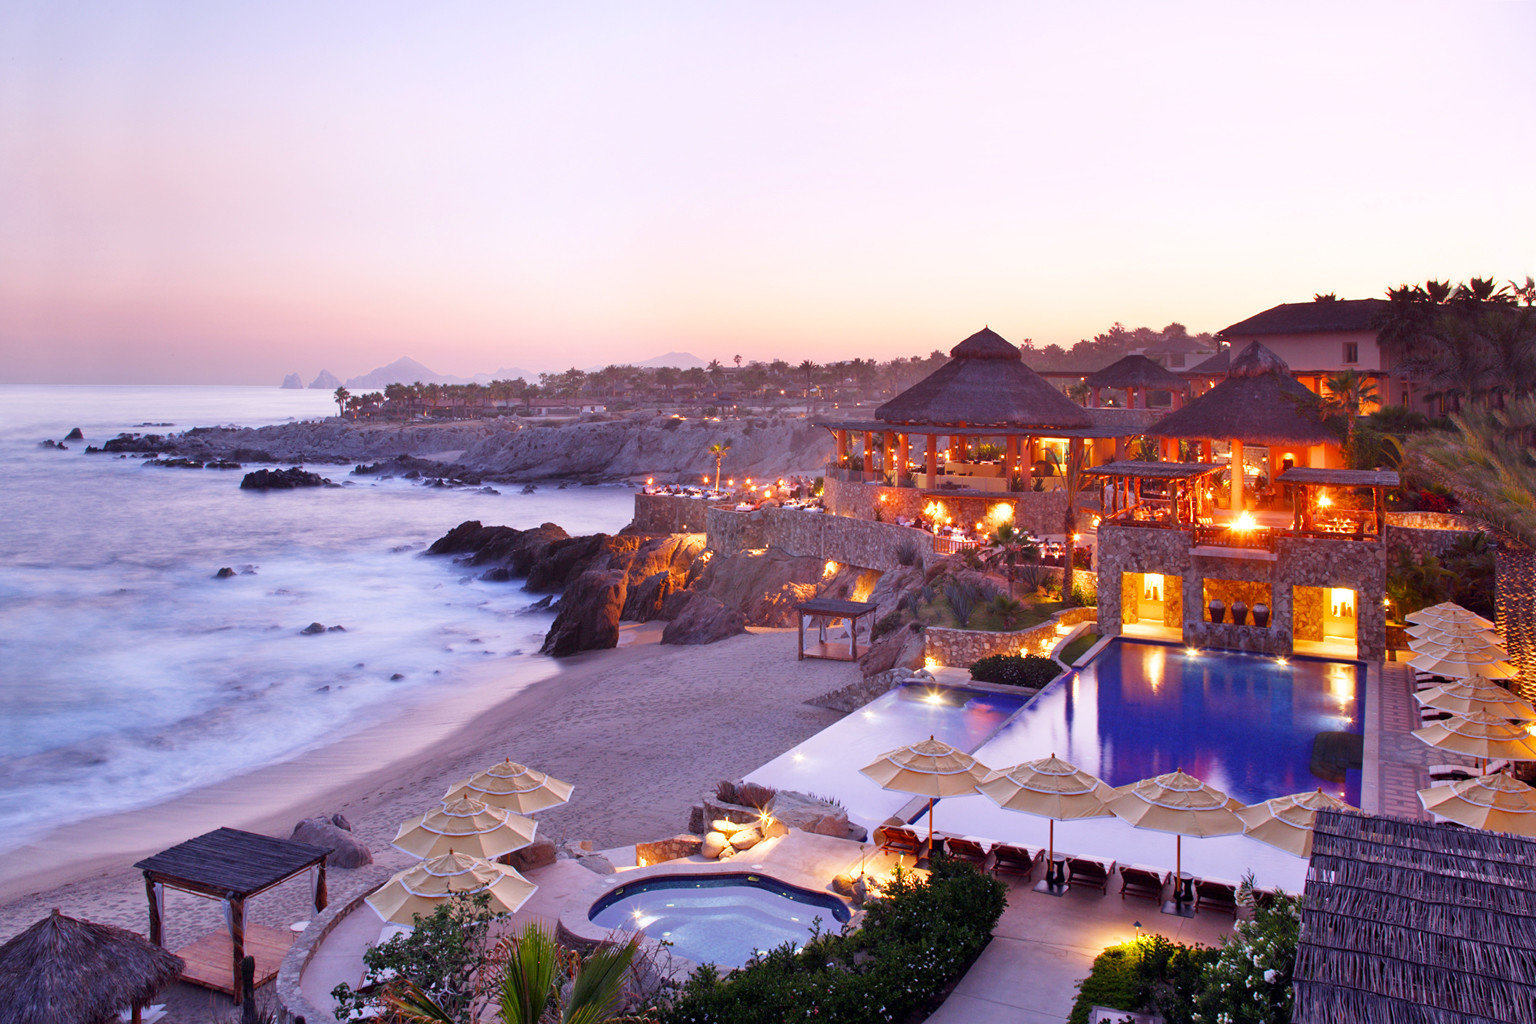 Hotels Romance outdoor sky water Resort Beach vacation evening Sea Coast Nature dusk Sunset